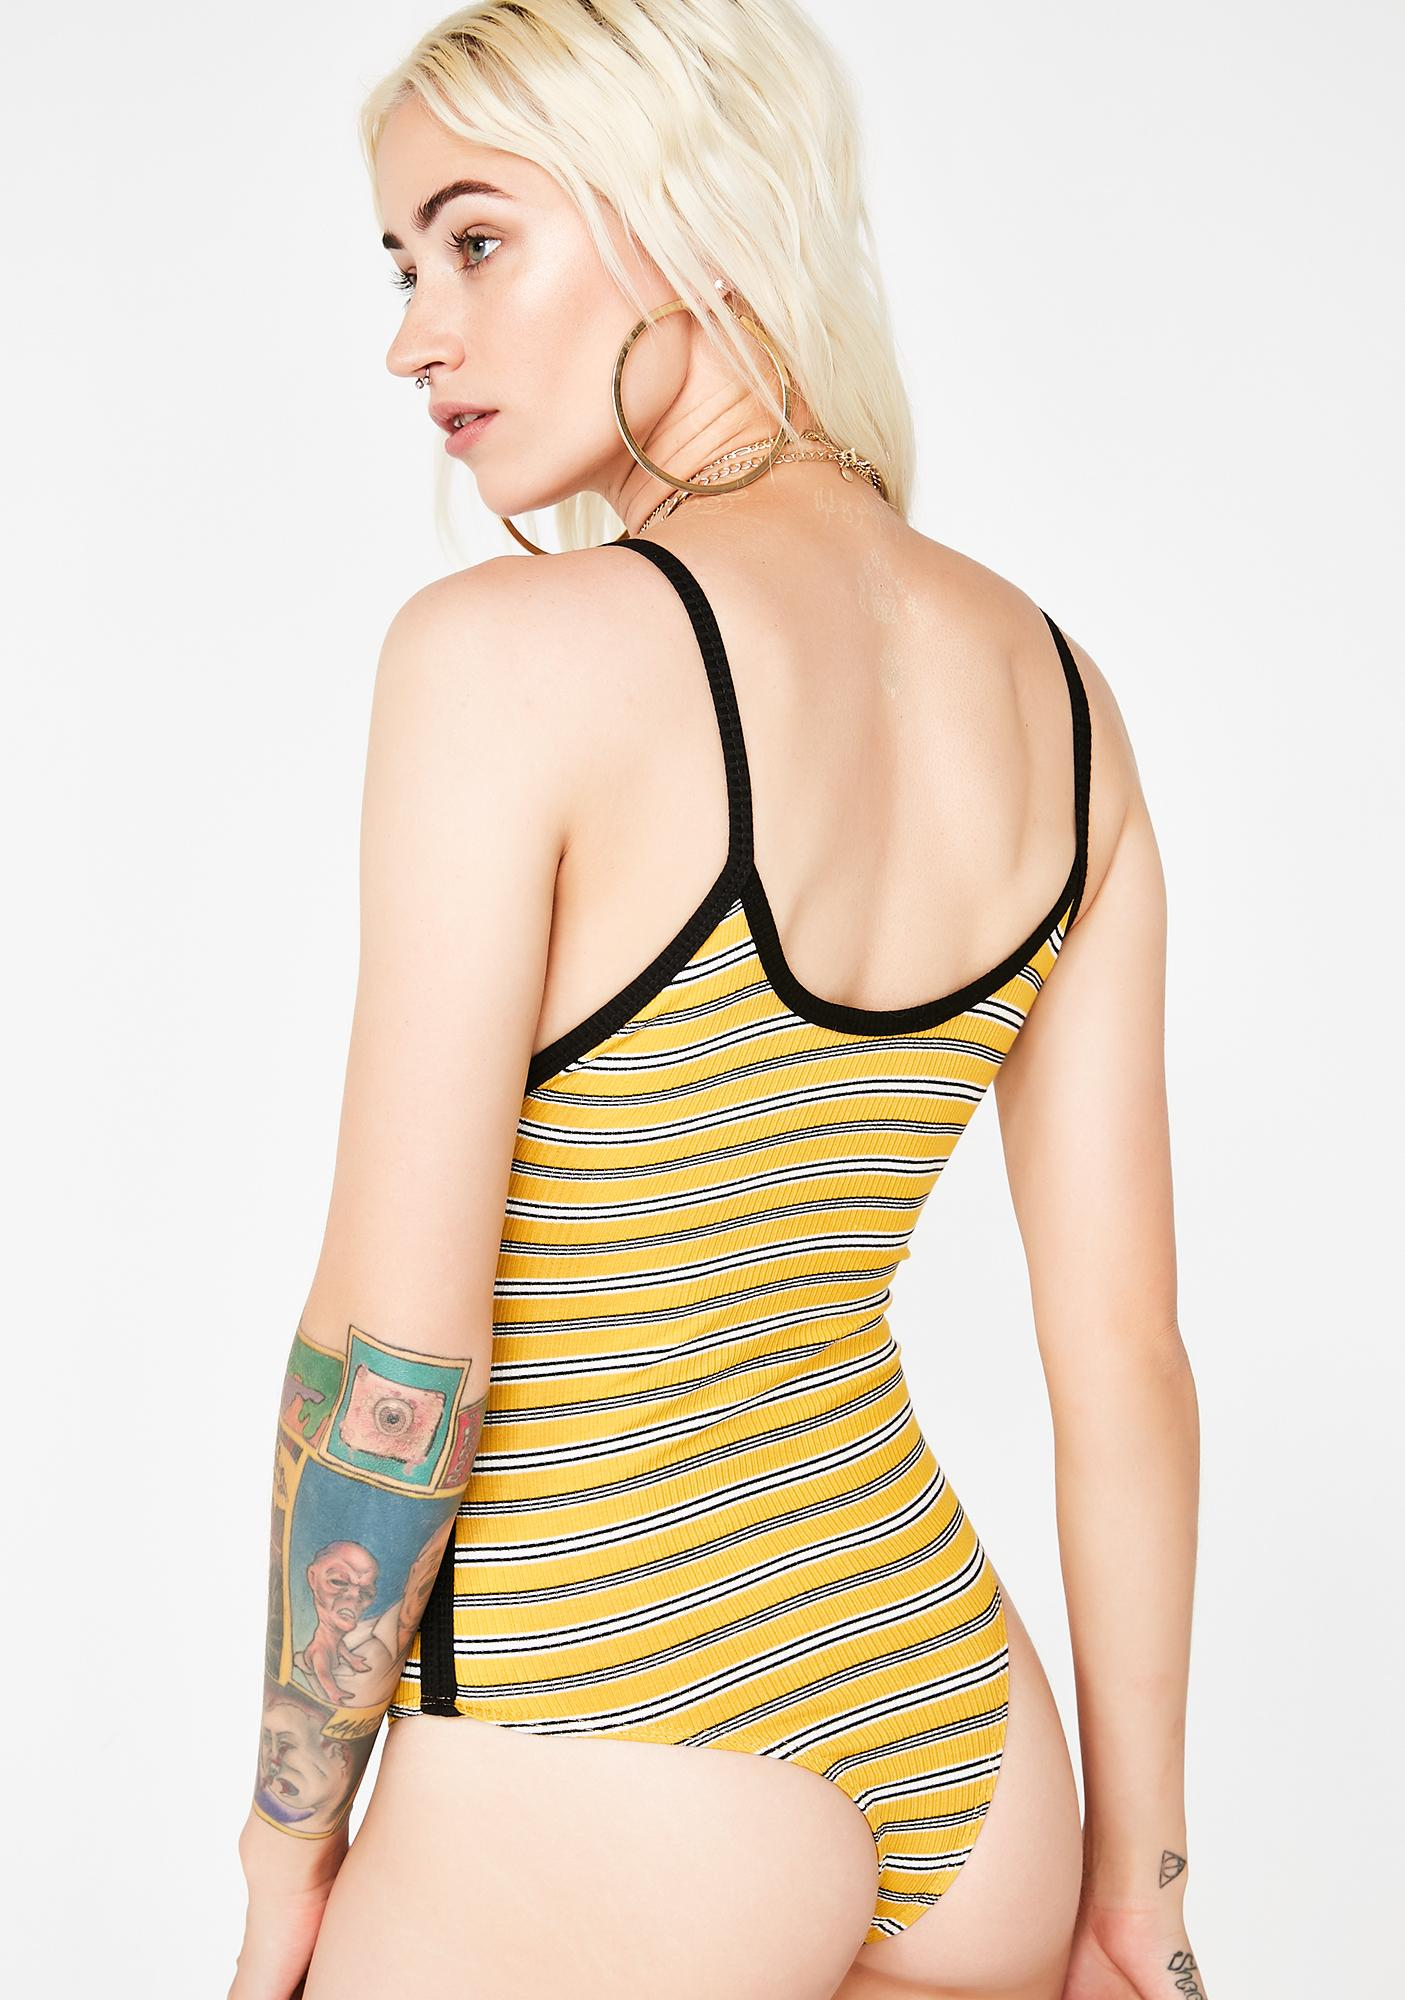 Sunny Wicked Chick Striped Bodysuit